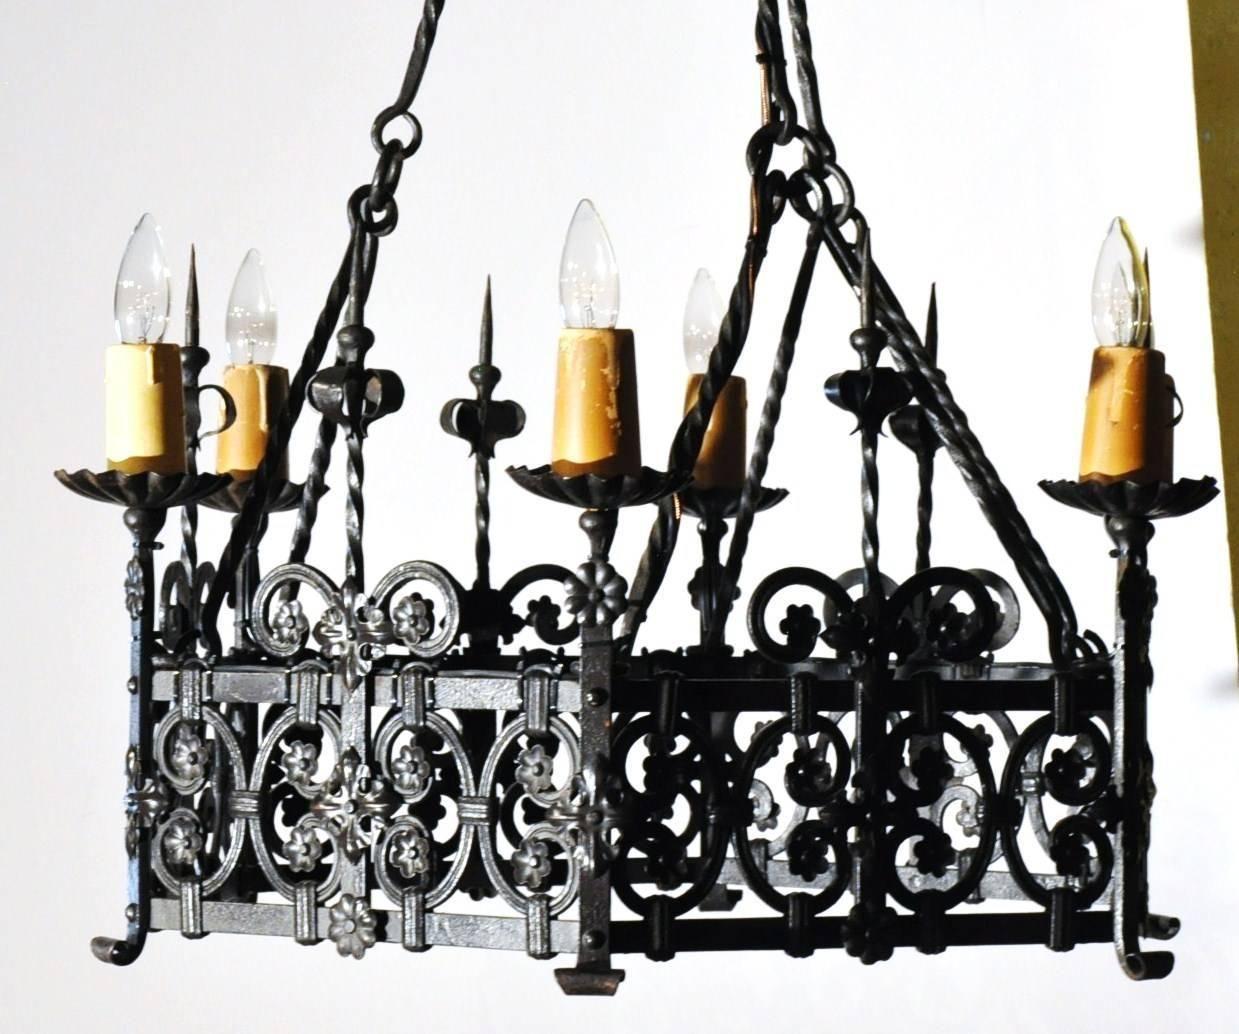 19th Century French Gothic Six-Light Black Wrought Iron Round Chandelier - 19th Century French Gothic Six-Light Black Wrought Iron Round